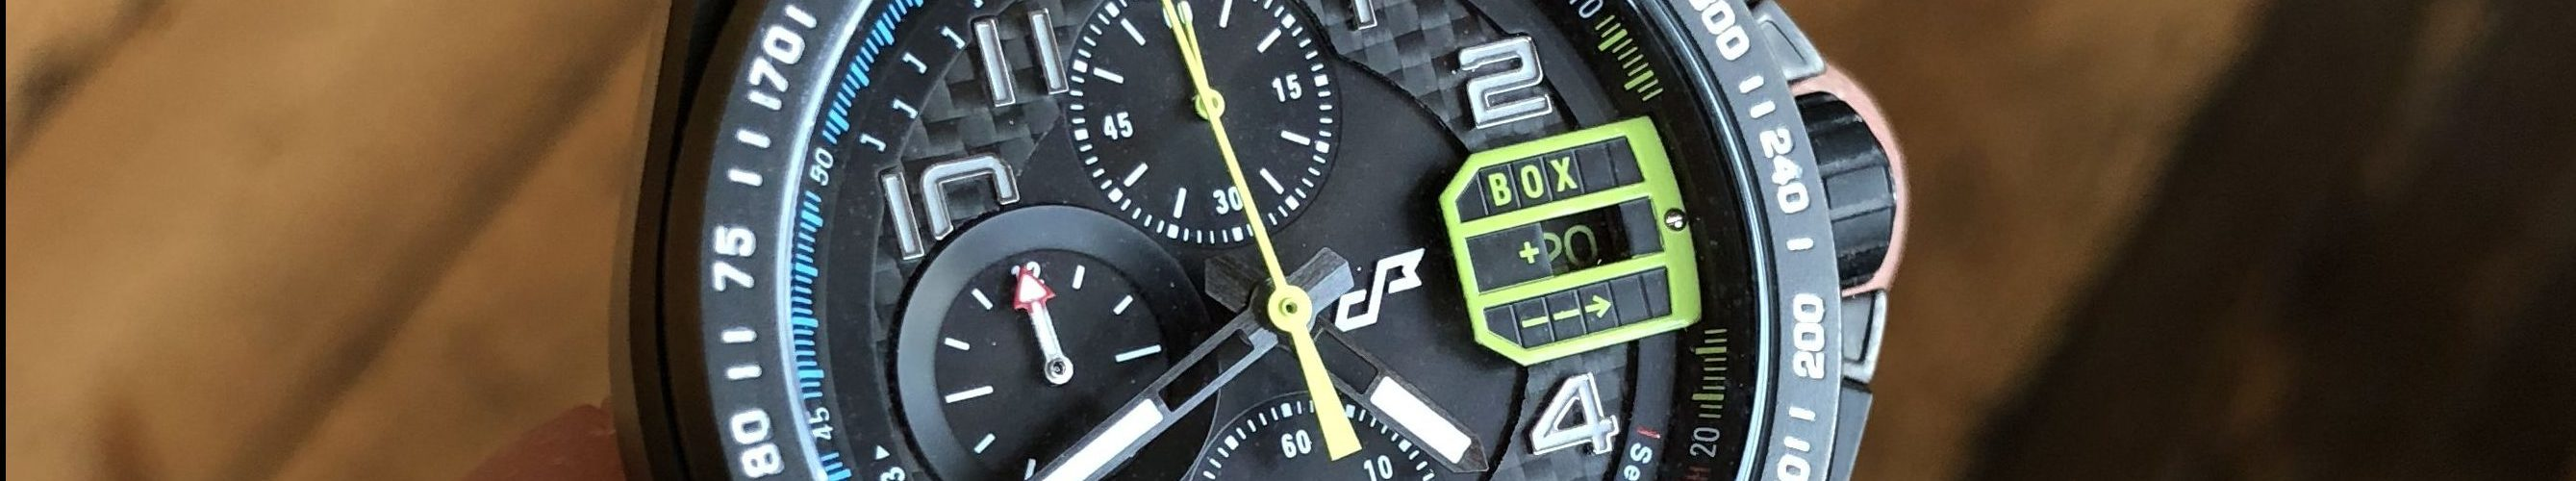 Carbon-Ziffernblatt Uhr Chrono Formel 1